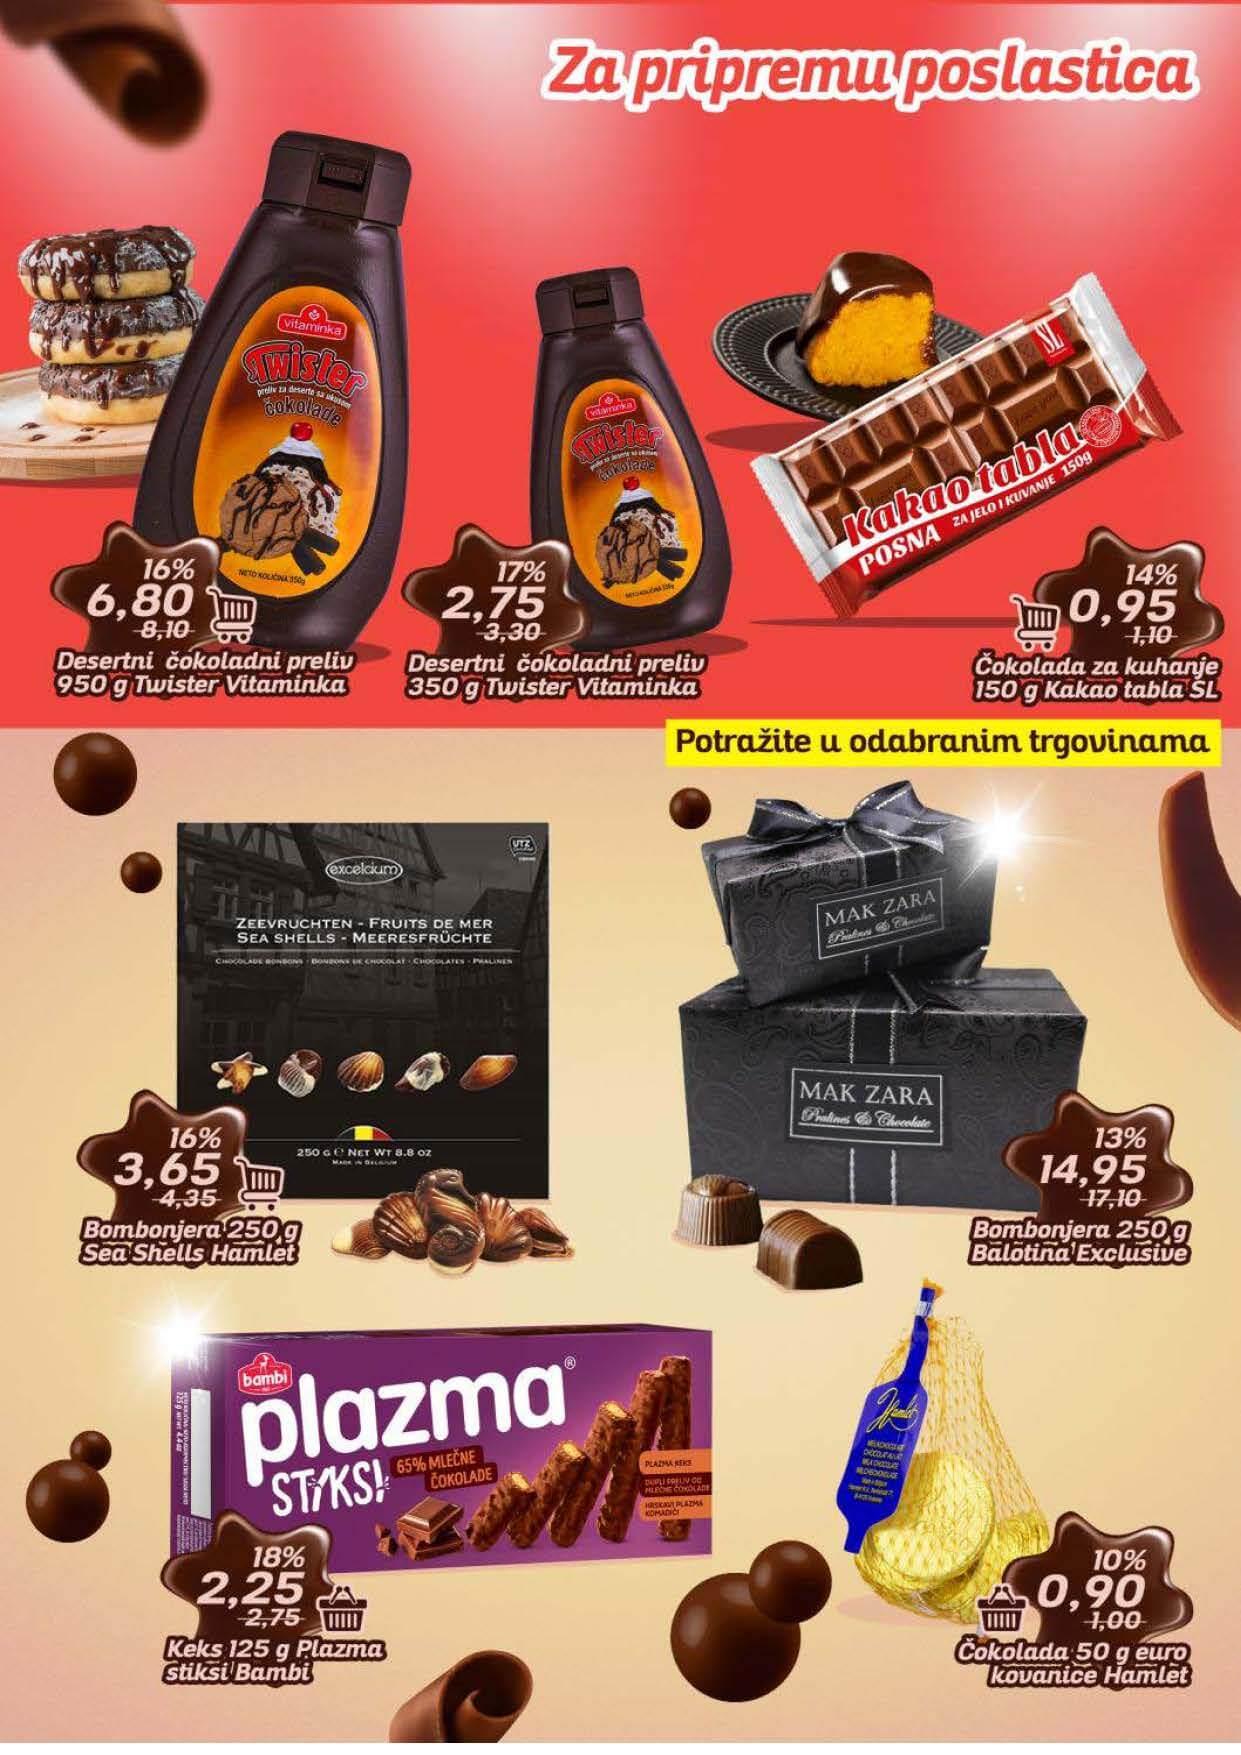 BINGO Katalog Dani cokolade JUL 2021 1.7.2021. 7.7.2021. Page 4